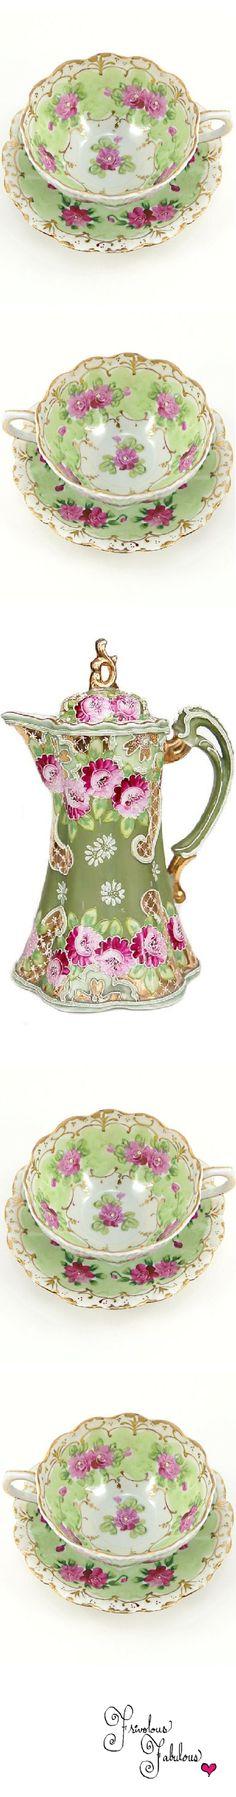 Frivolous Fabulous - Garden Tea Party